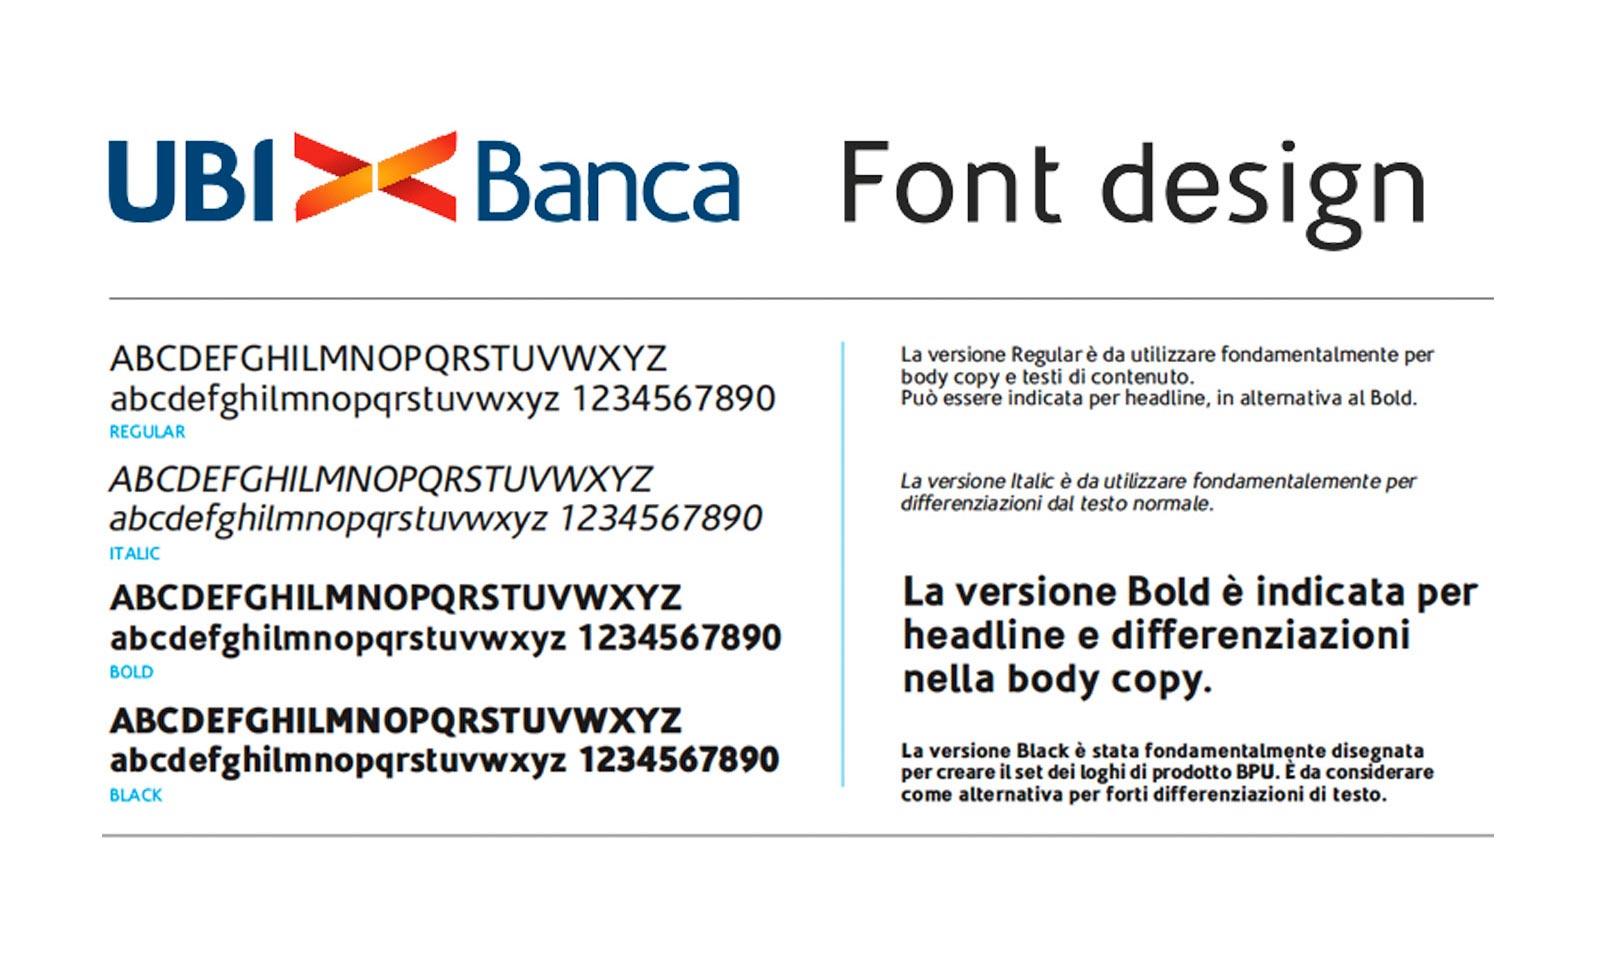 ubi banca brand rebranding font typeface design